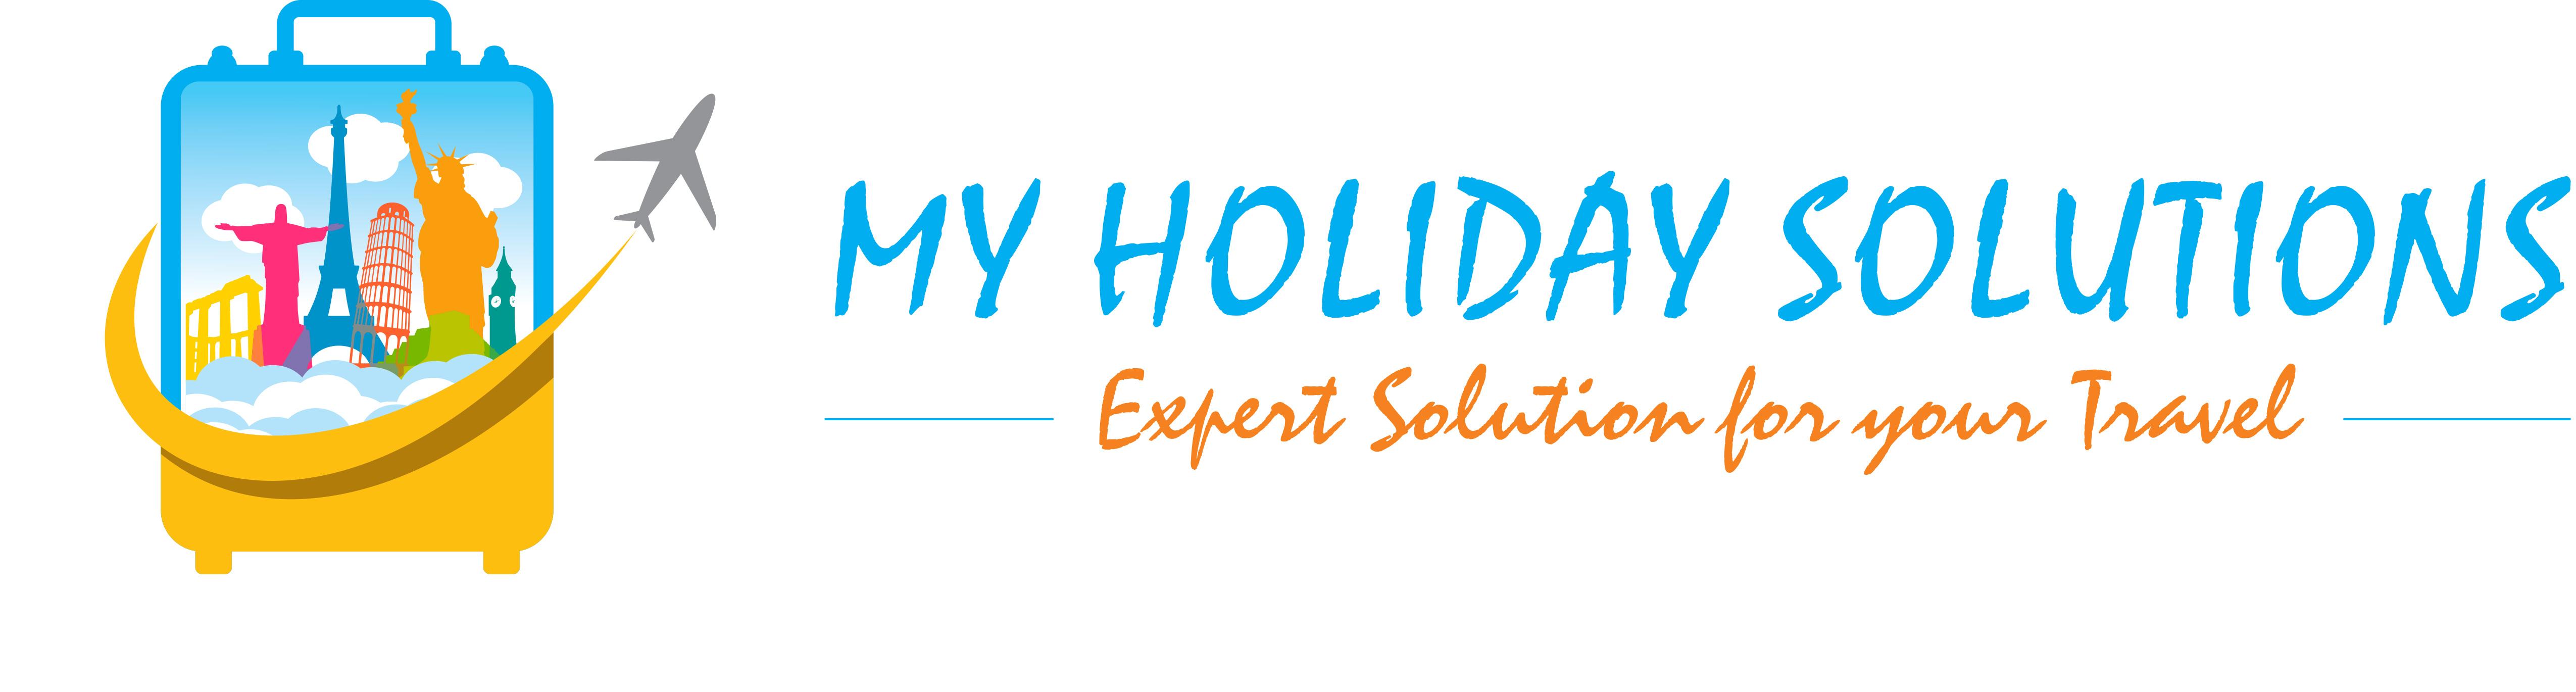 International Tour Packages Online Holiday Book Flights Hotels Canada Tashkent Merchants